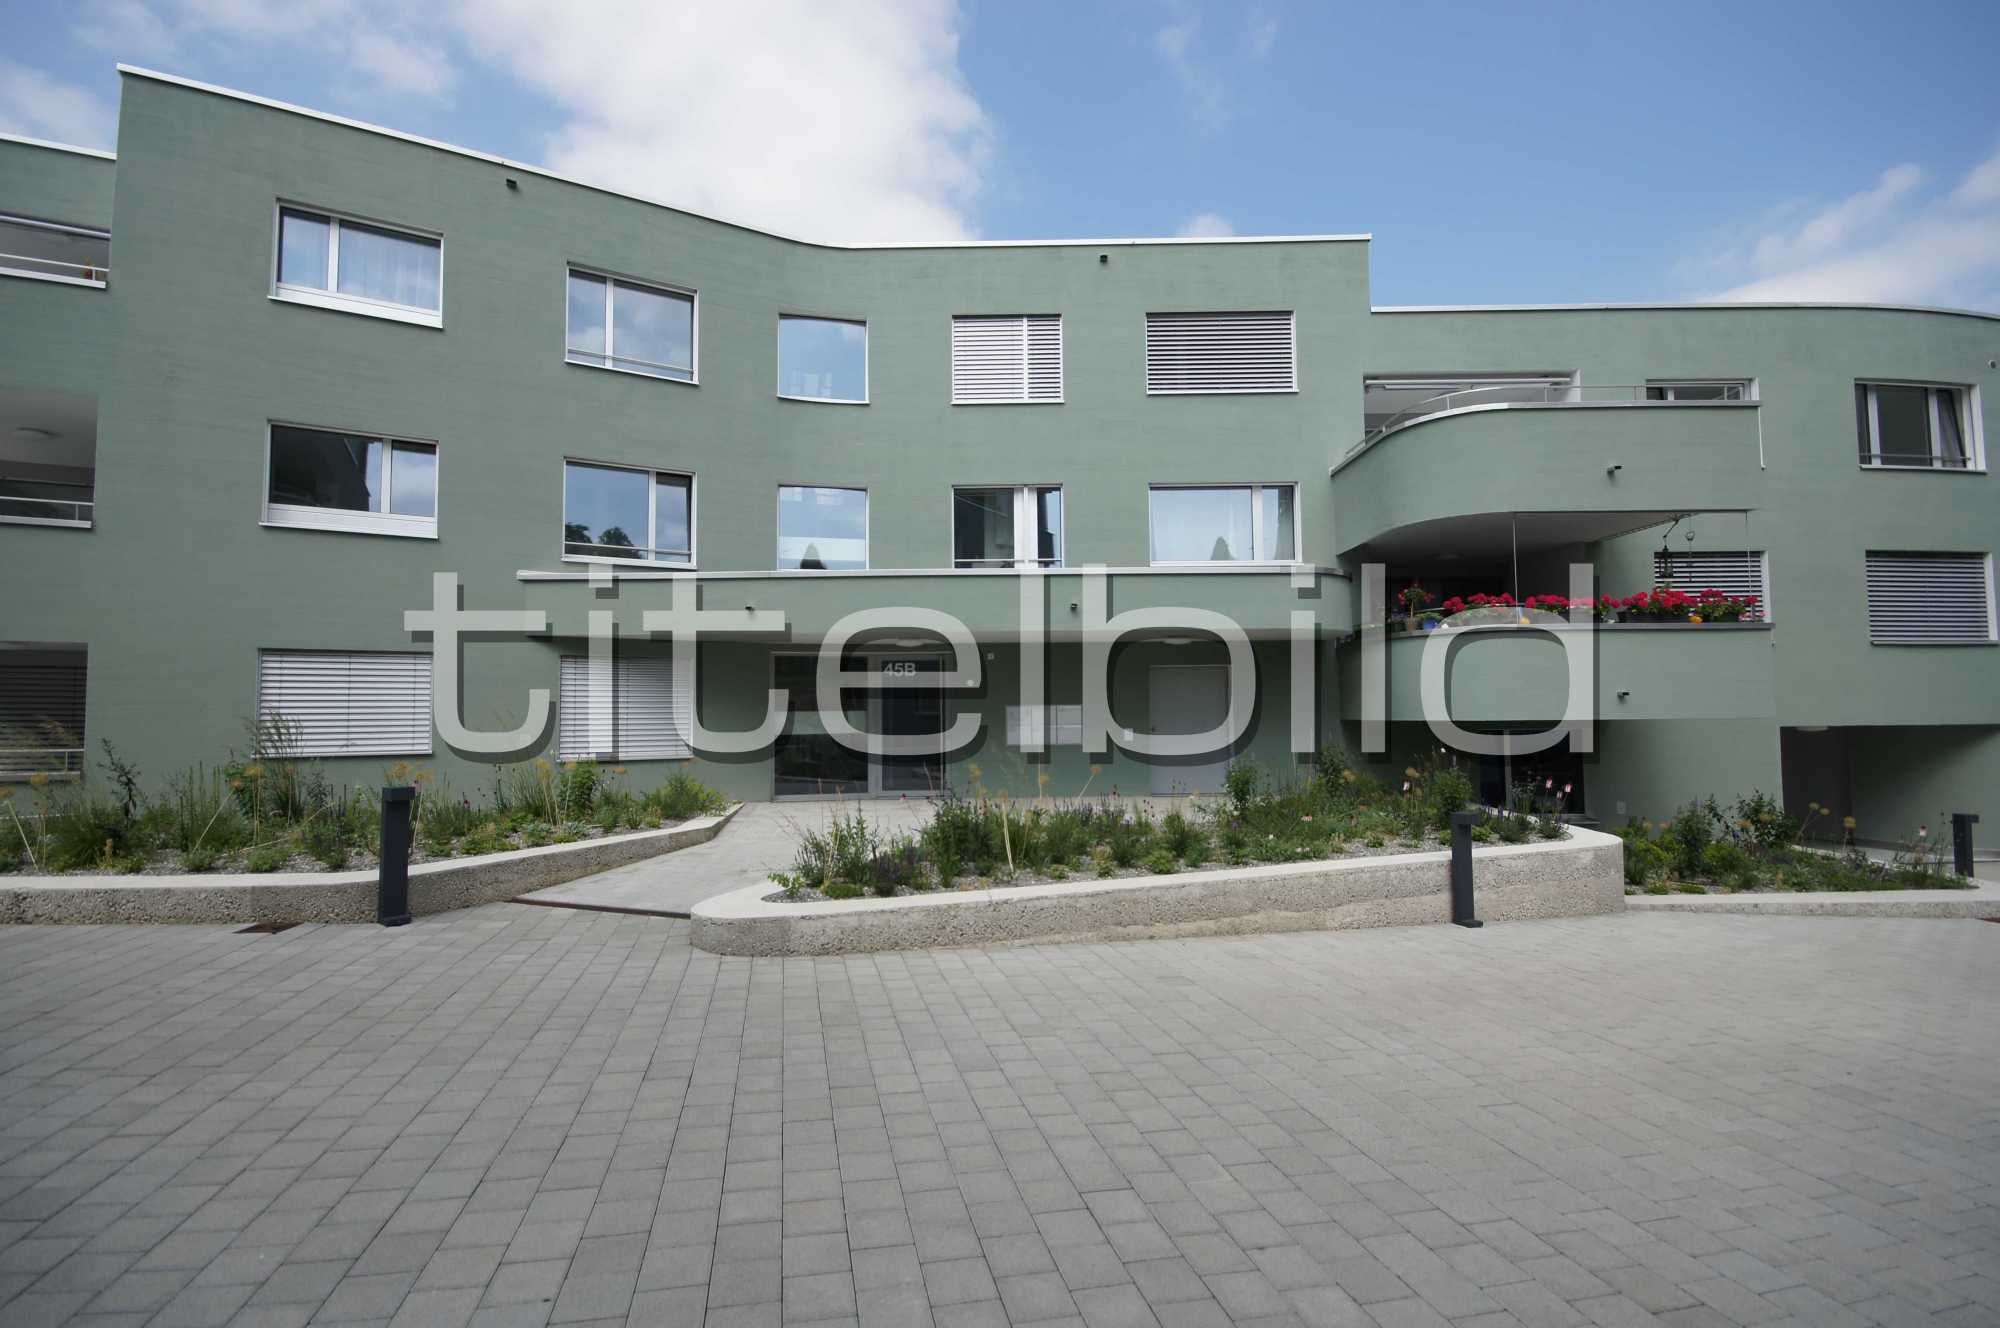 Projektbild-Nr. 8: Wohnüberbauung Widmi 3